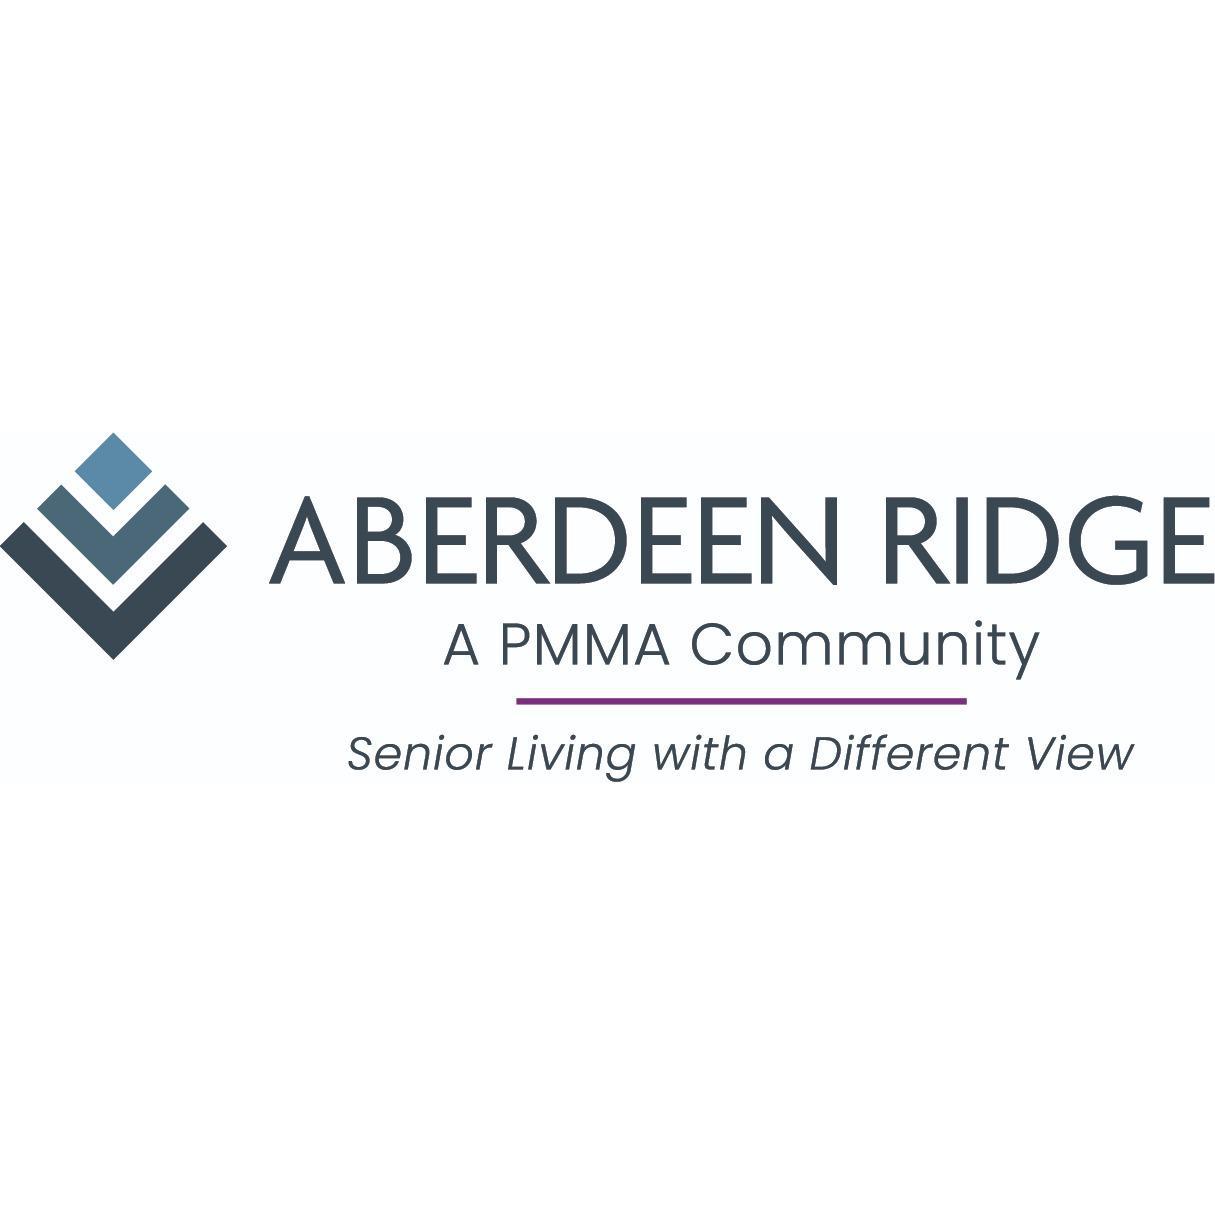 Aberdeen Ridge